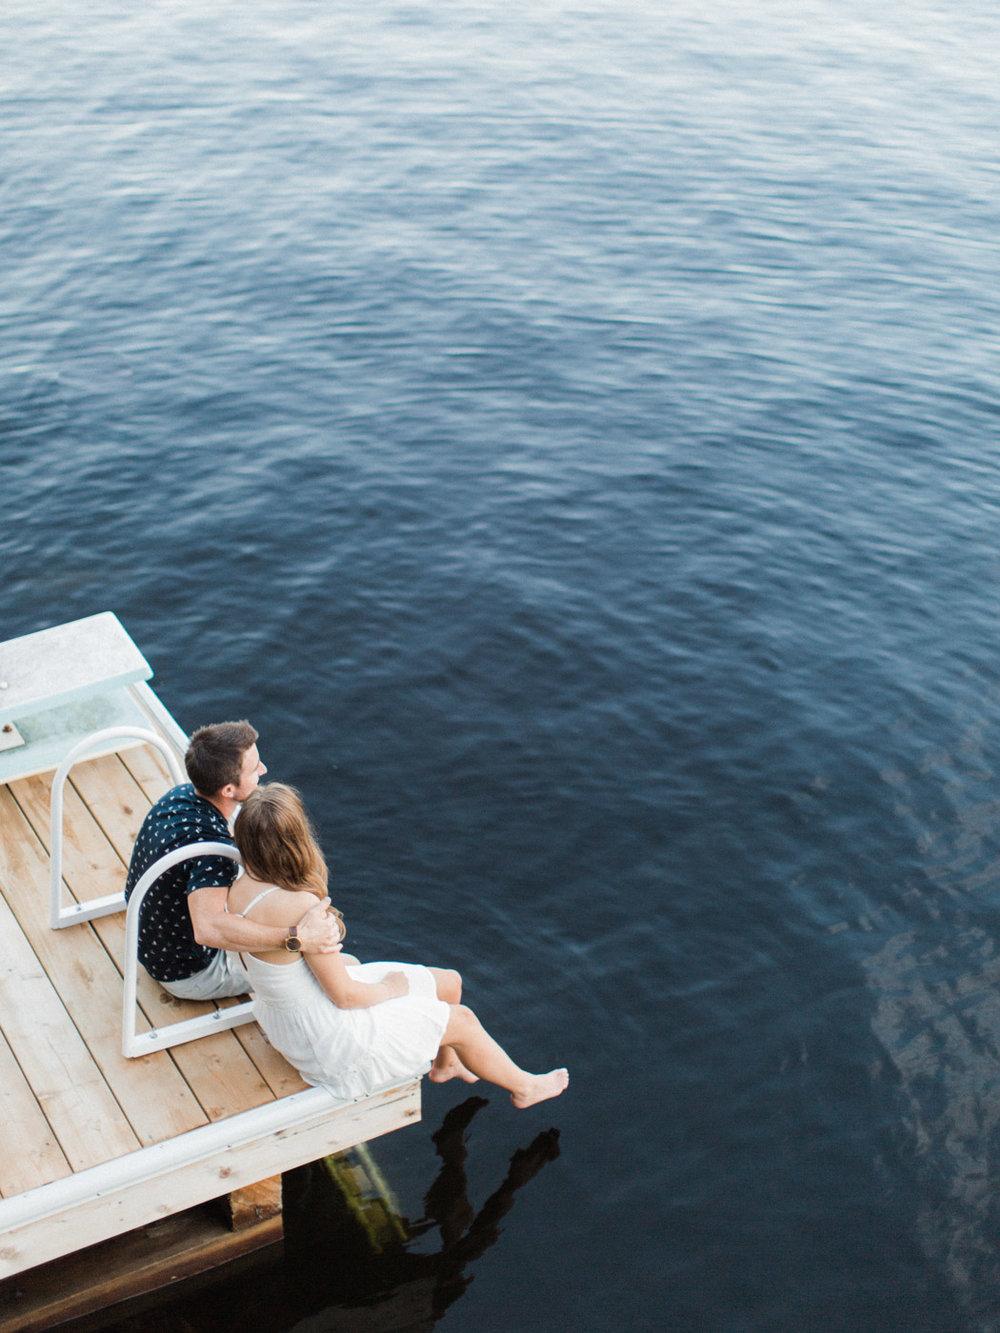 Muskoka engagement session on the dock